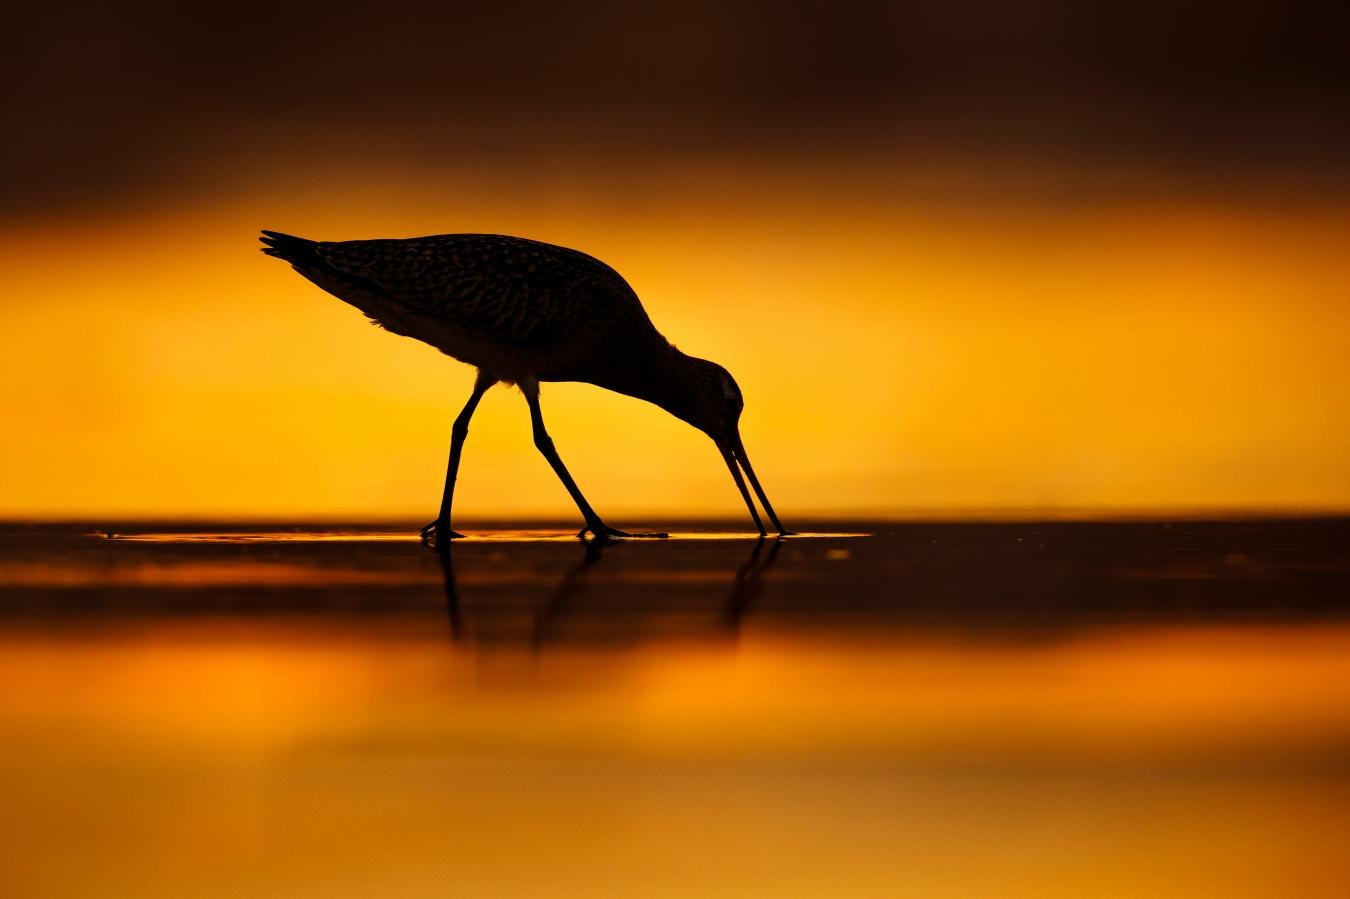 Peace of mind - Mario Suarez - Portfolio Natural, Fotografía de Naturaleza de Autor